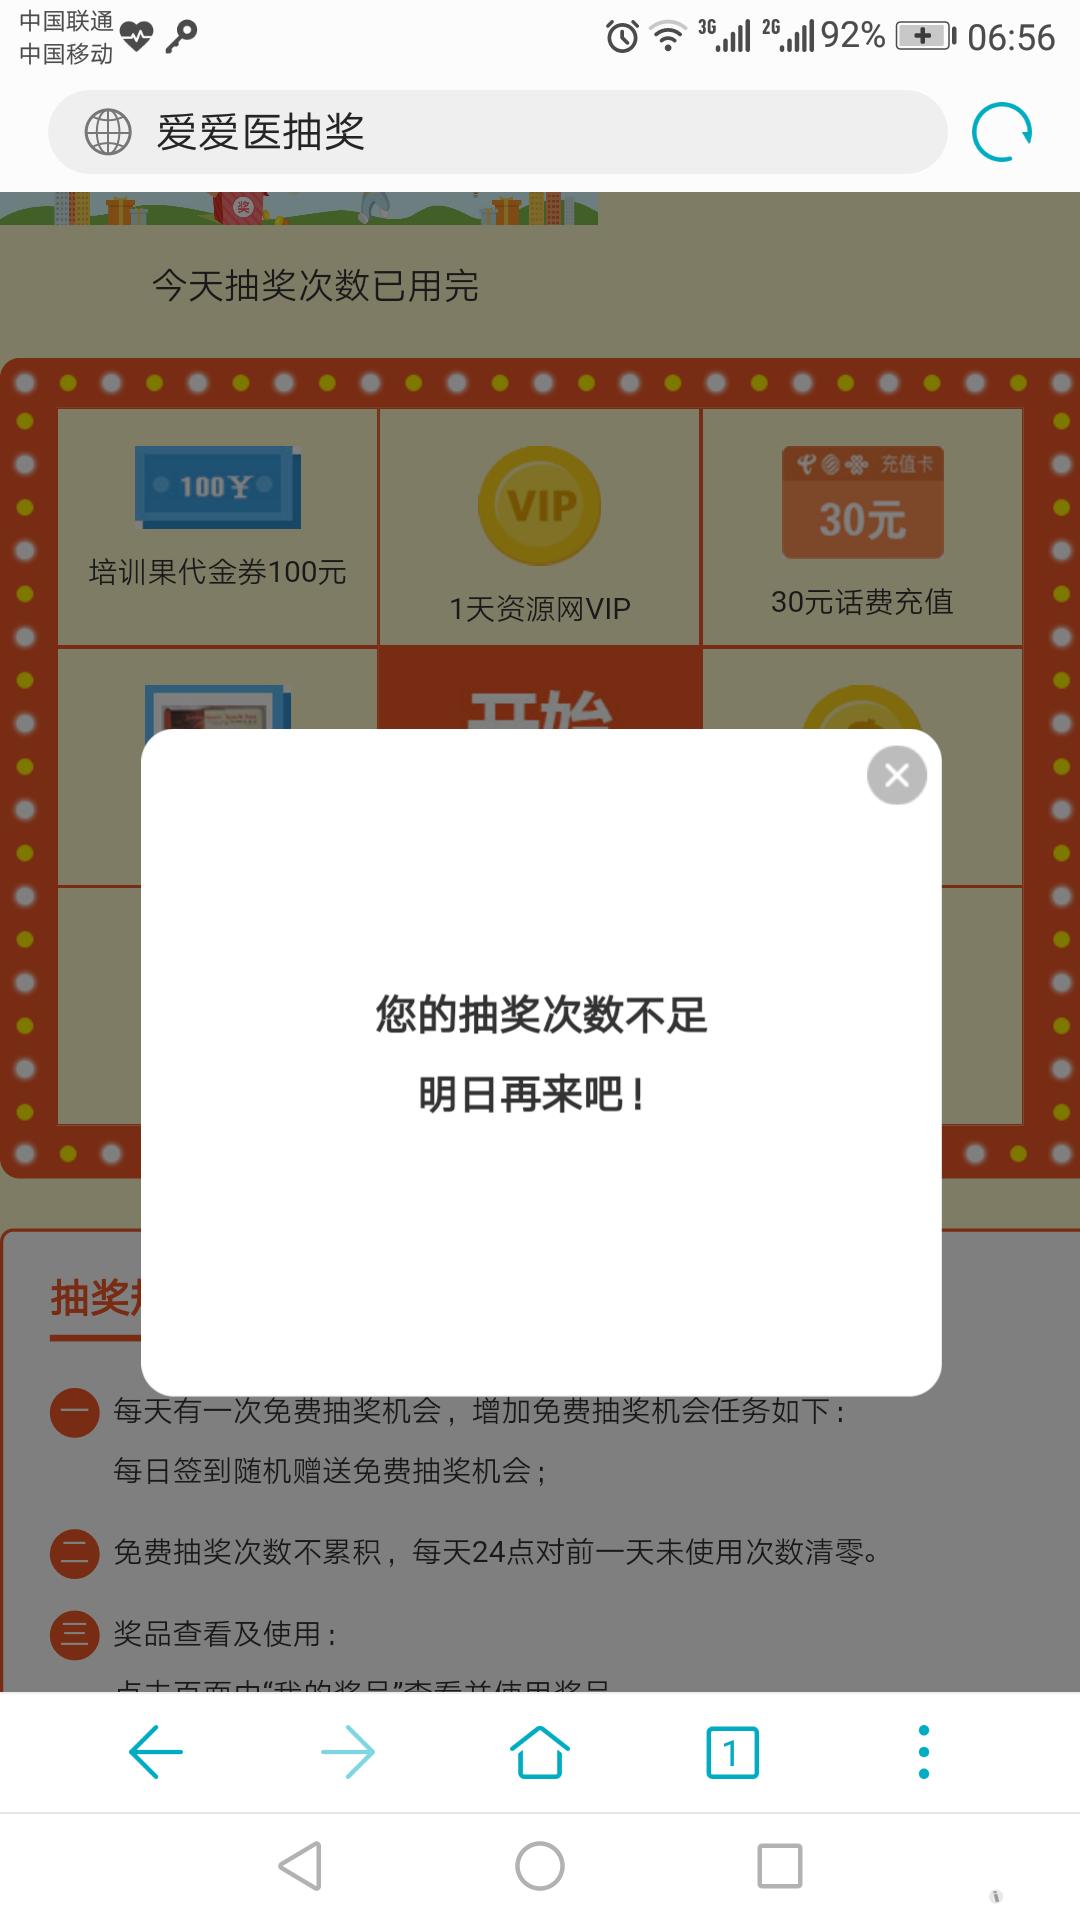 Screenshot_20180508-065645.png